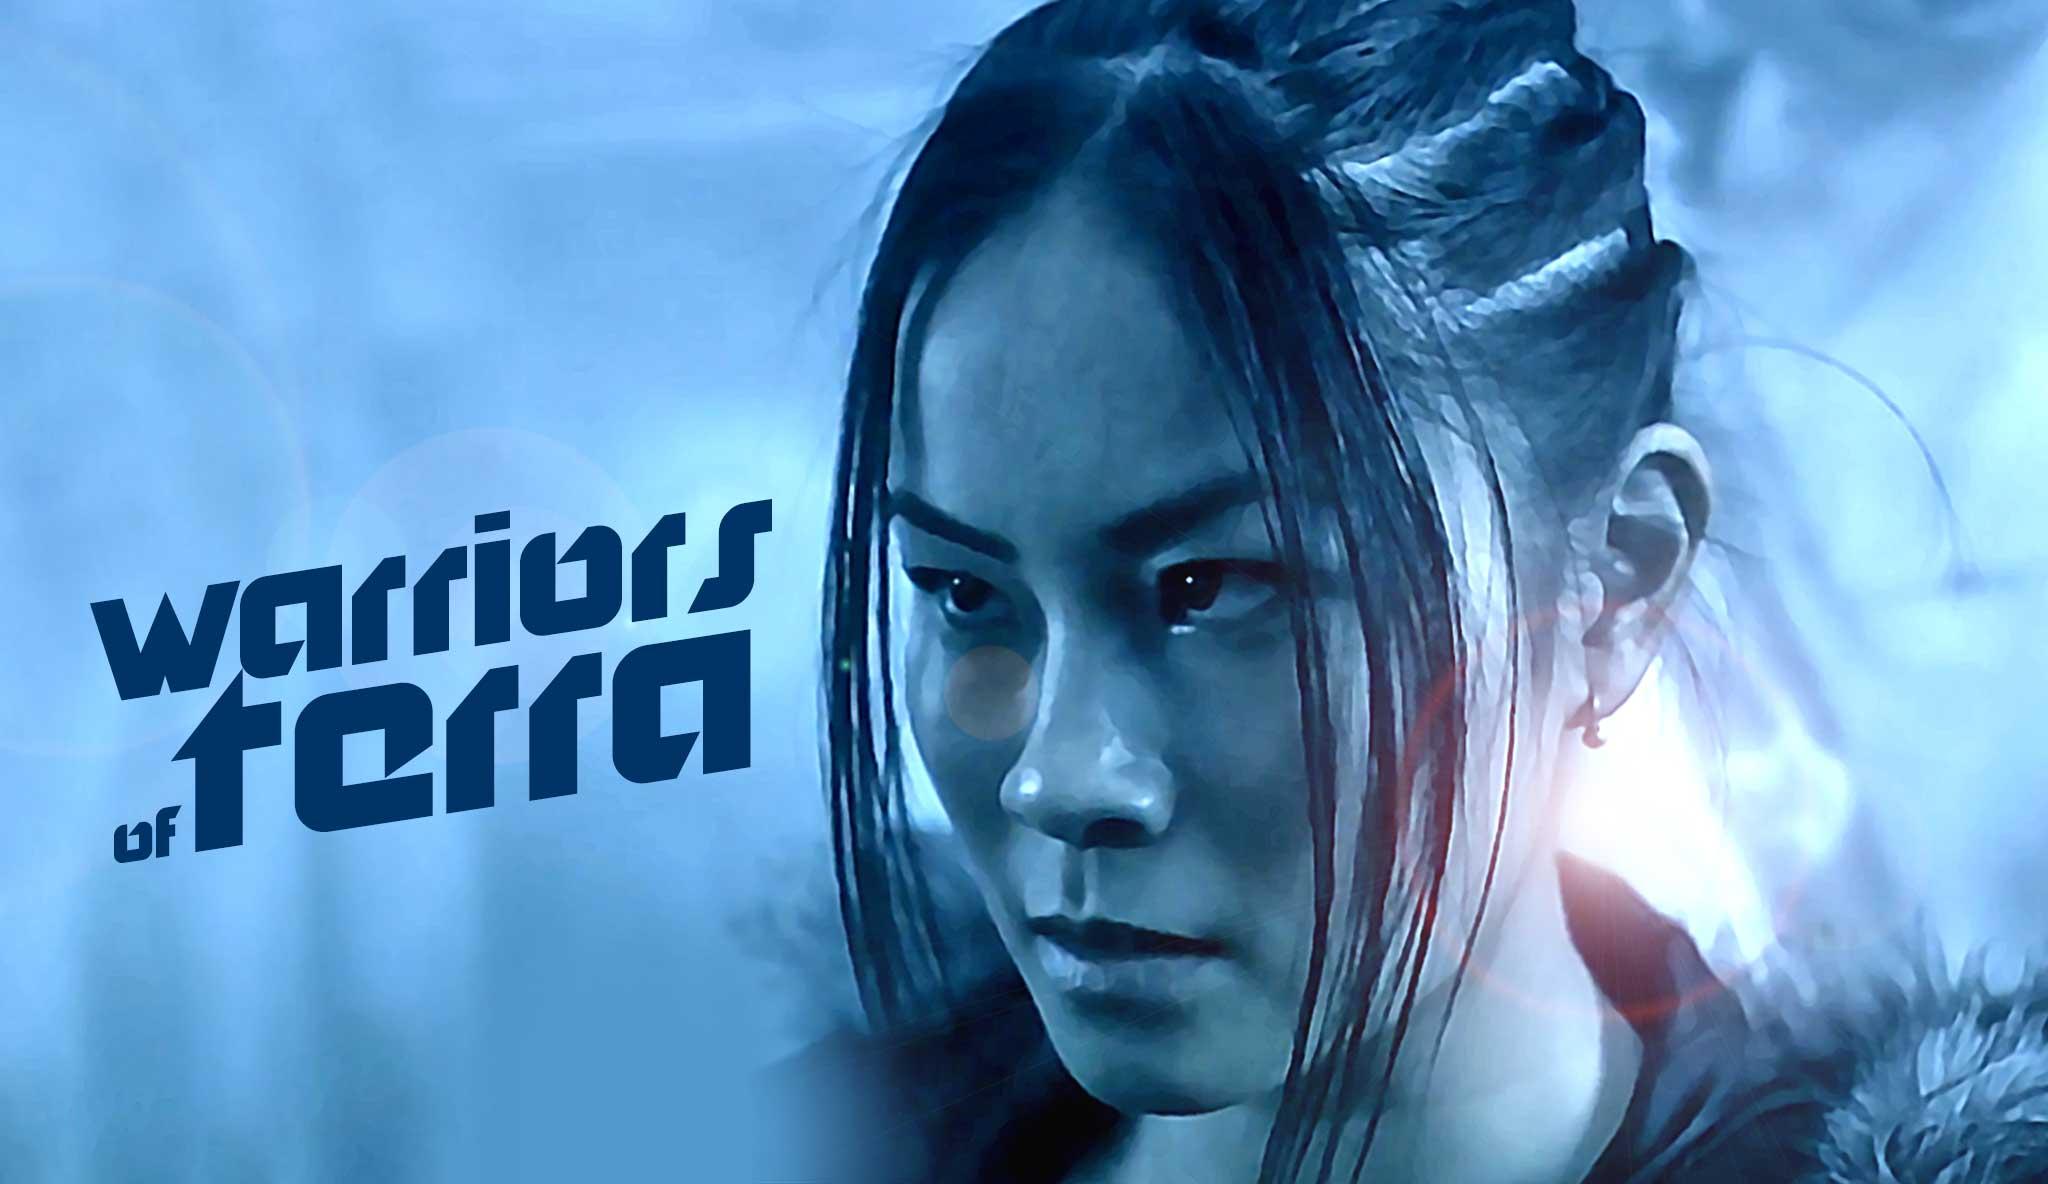 warriors-of-terra\header.jpg